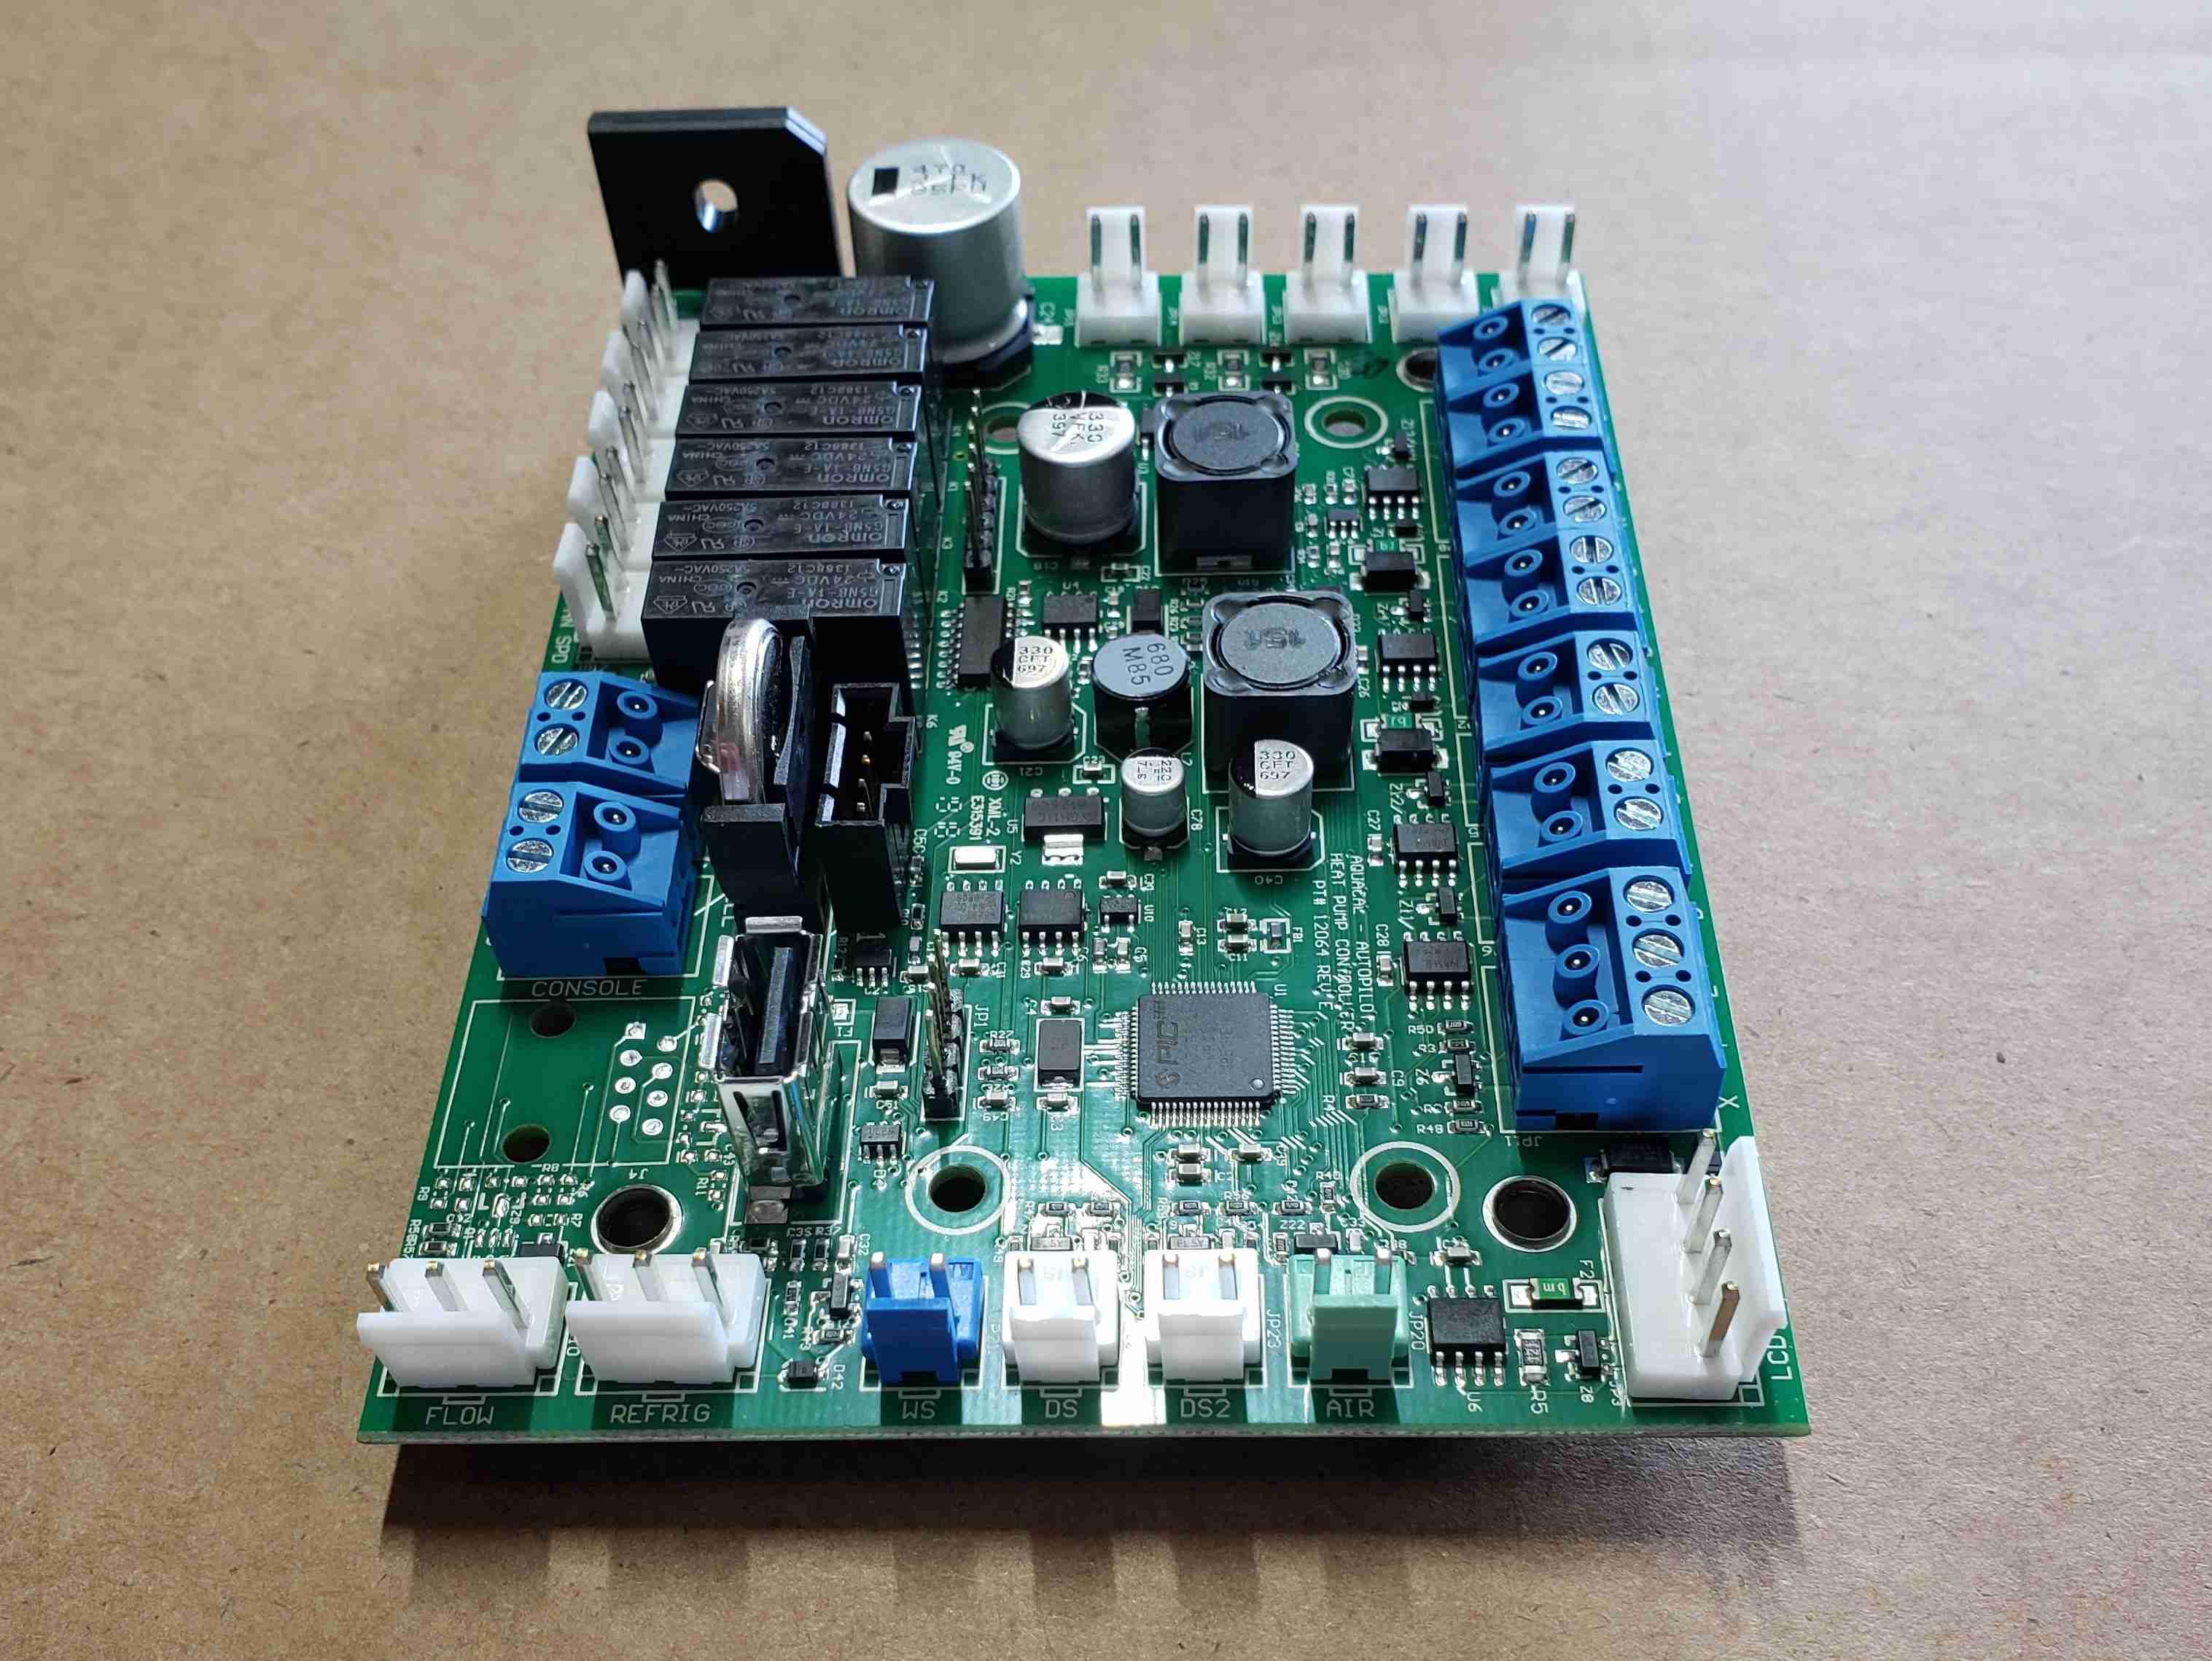 New Smart Control Main PCB Control Board Perspective View